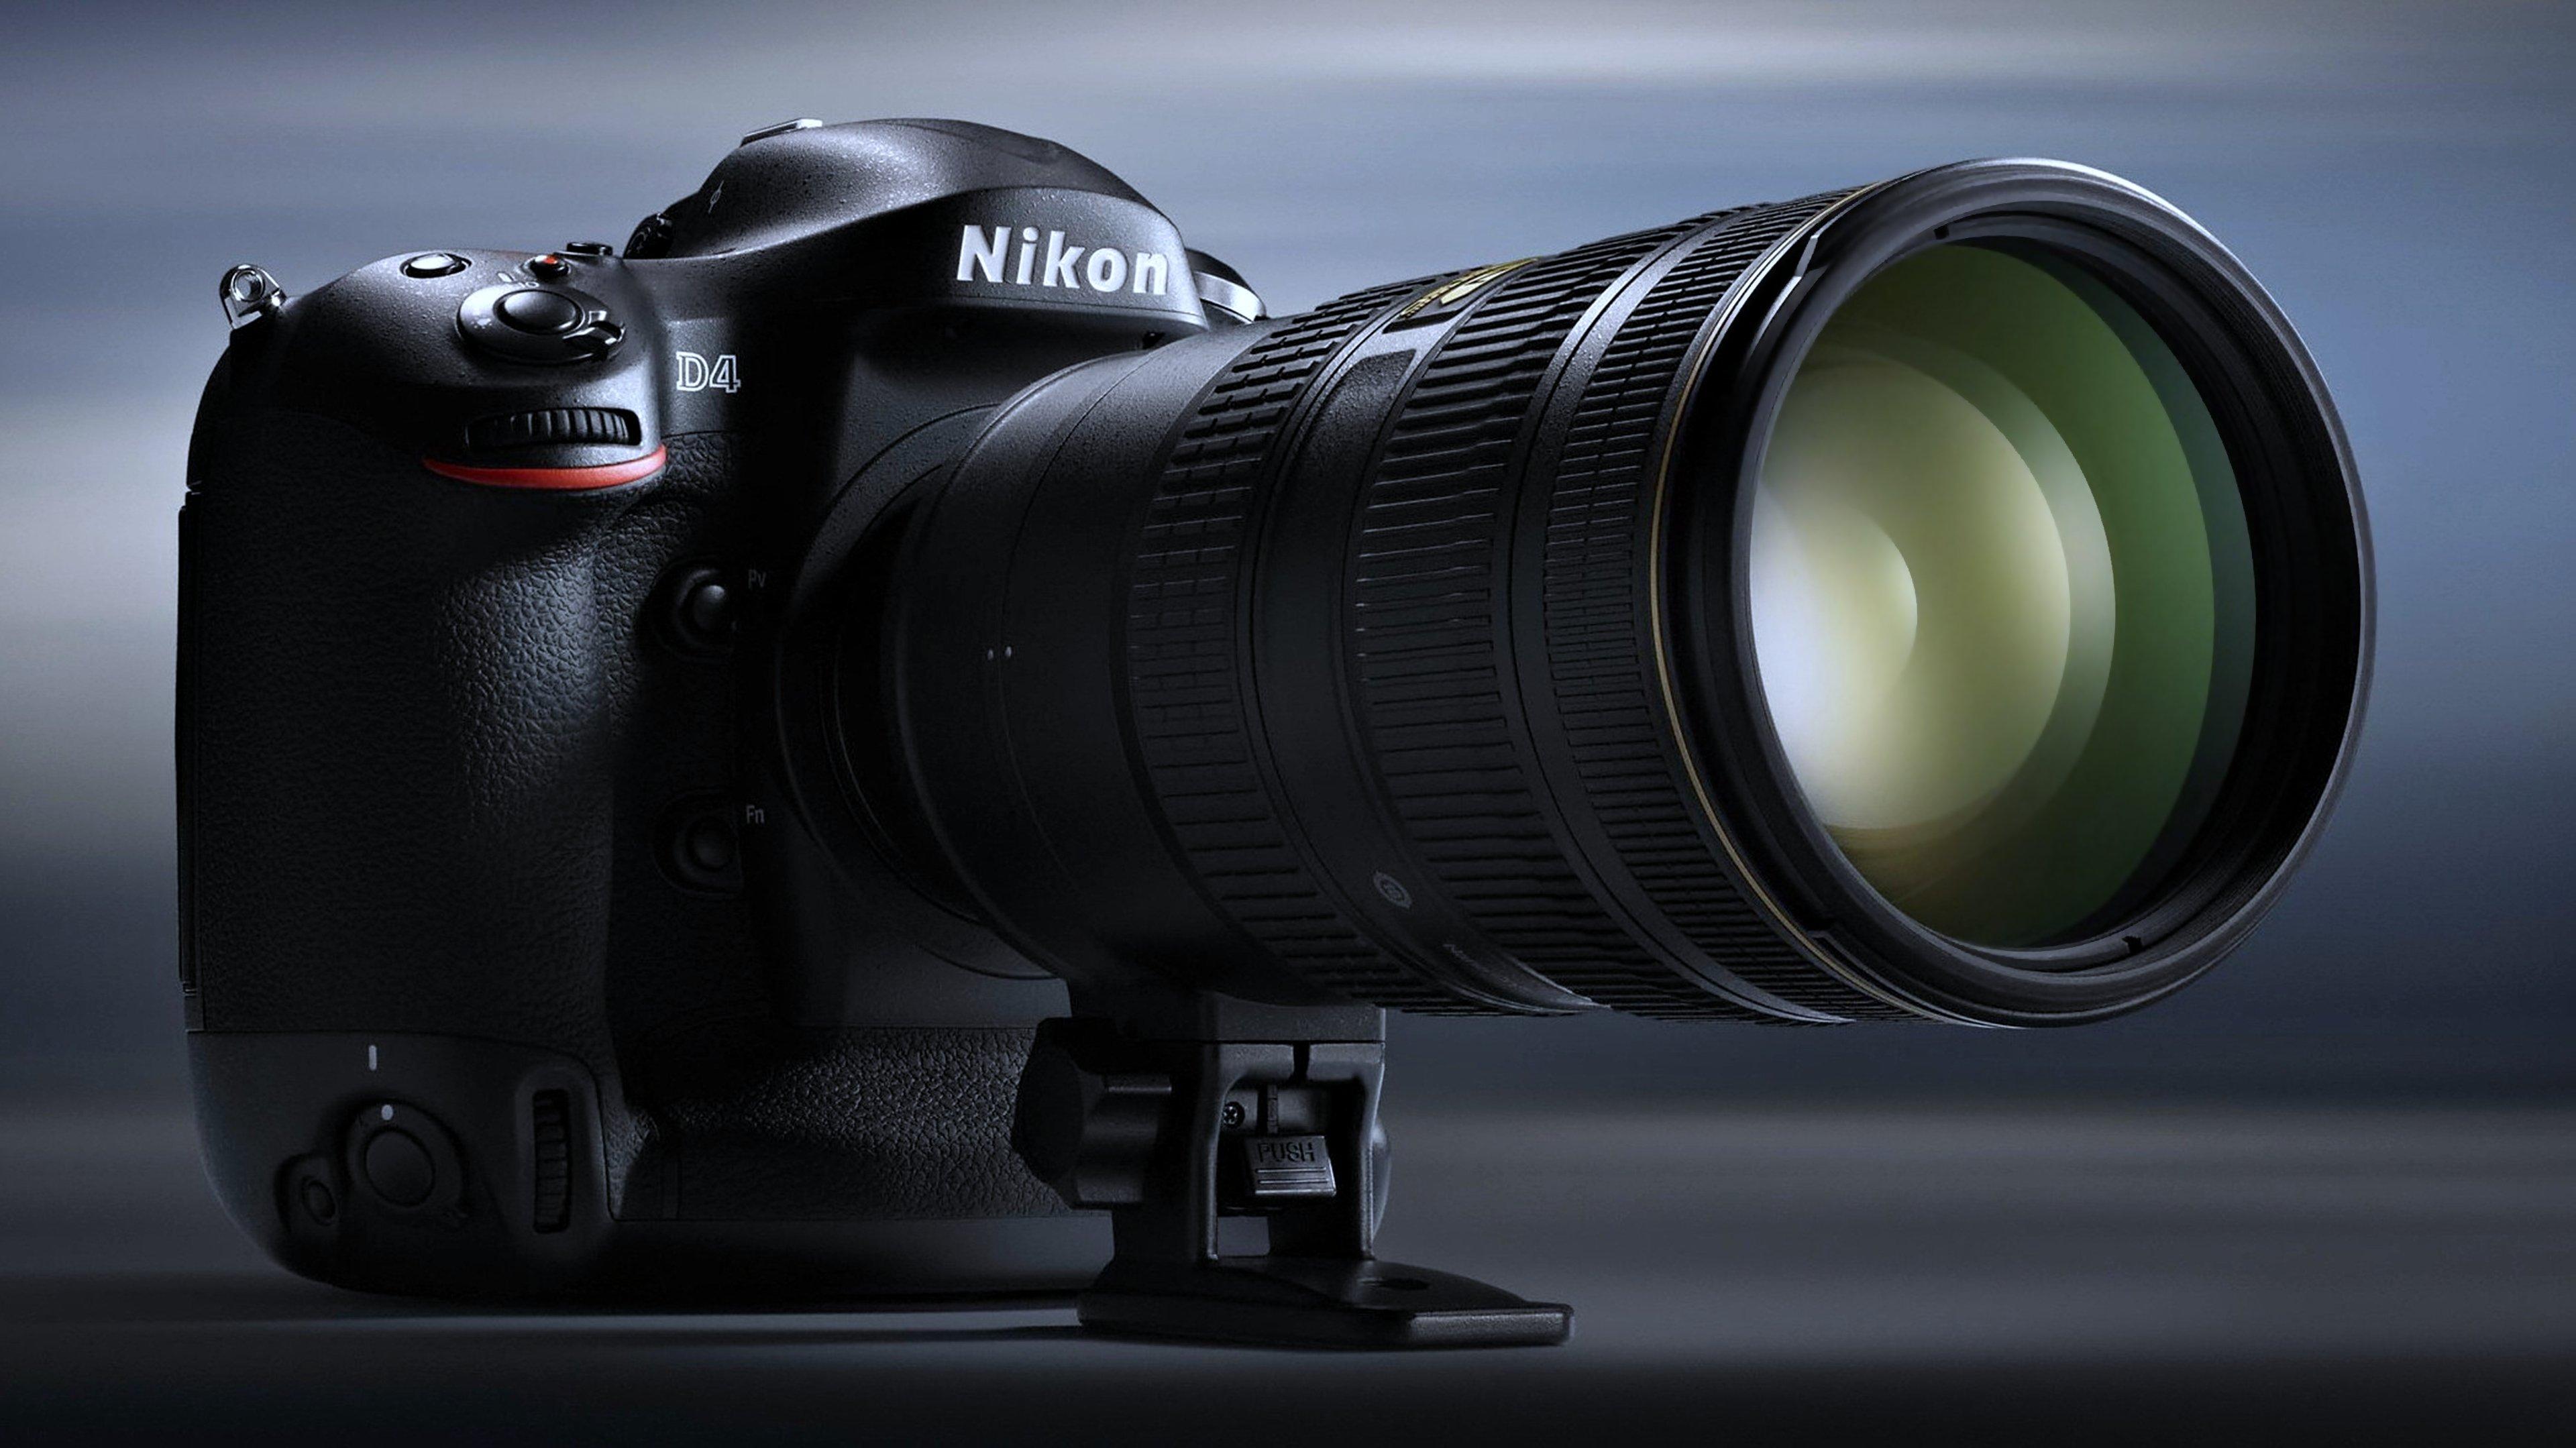 Nikon D4 camera photos Technology wallpaper | 3840x2159 ...